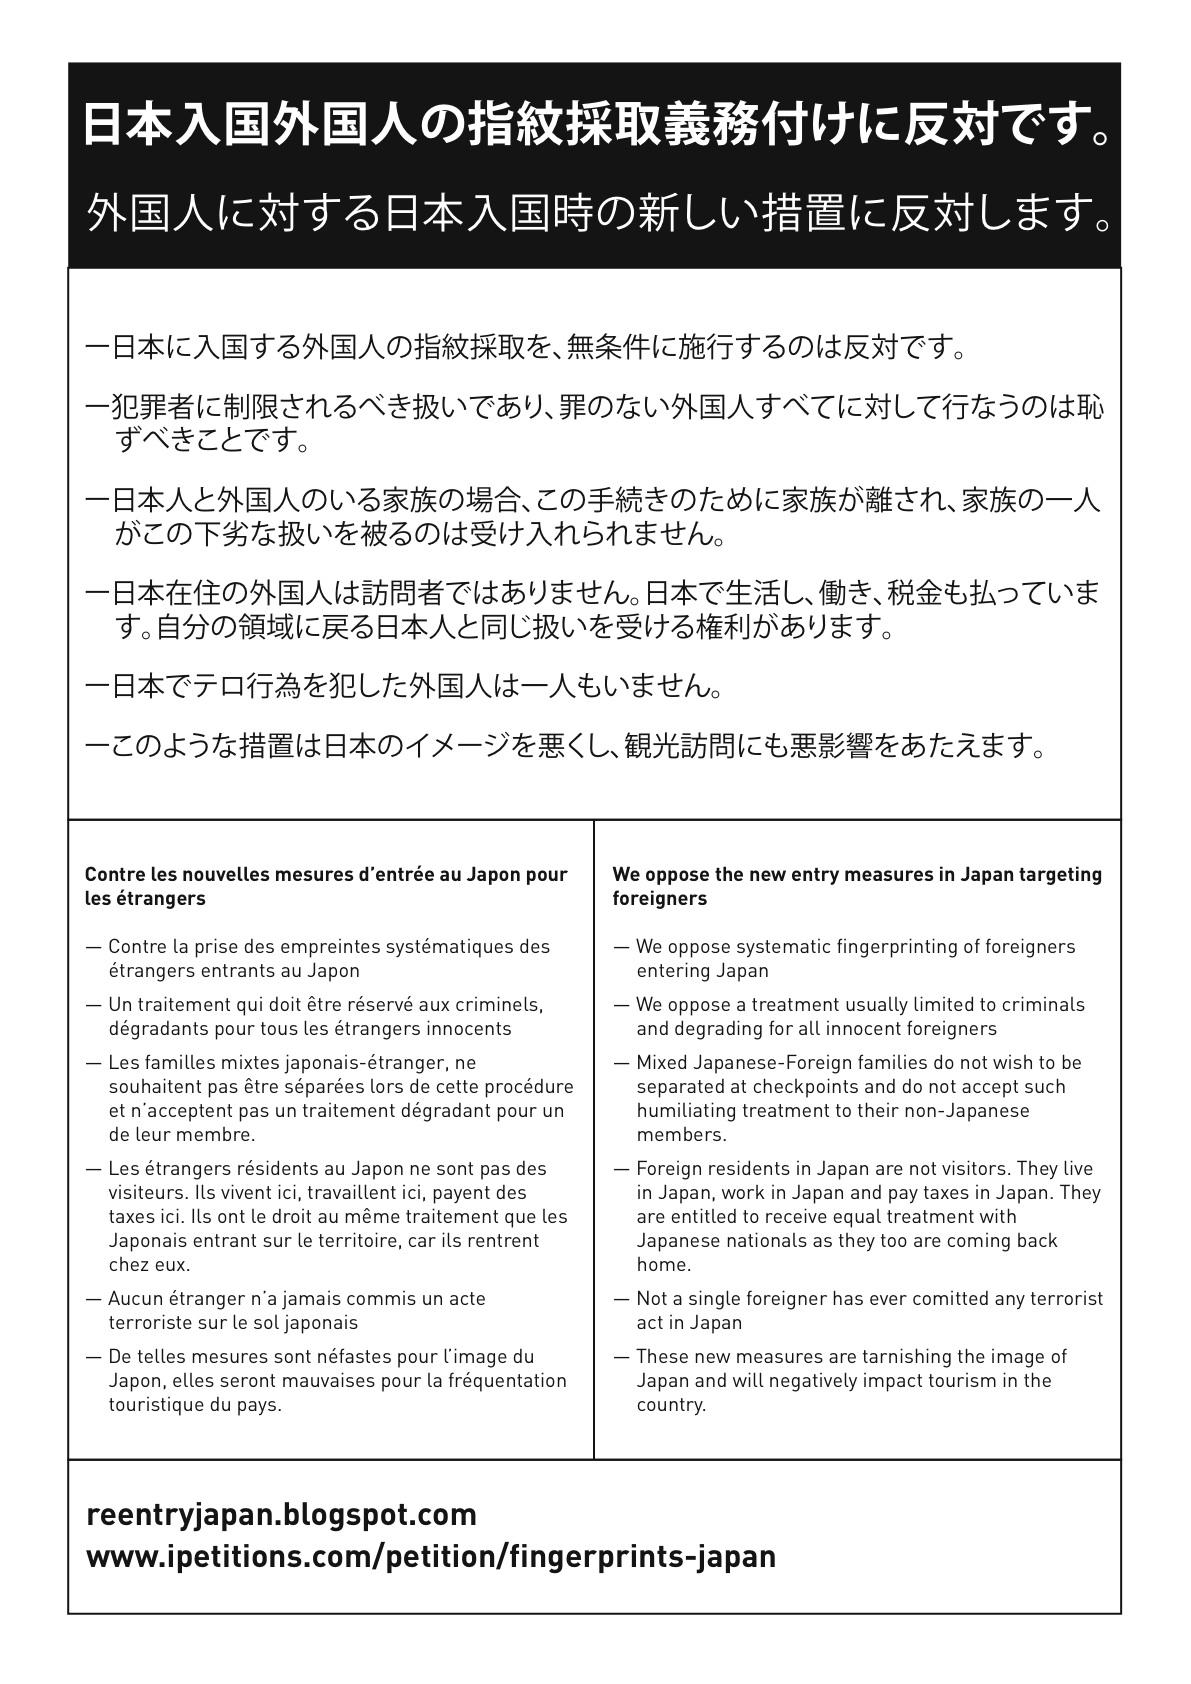 ReentryJapanProtest.jpg